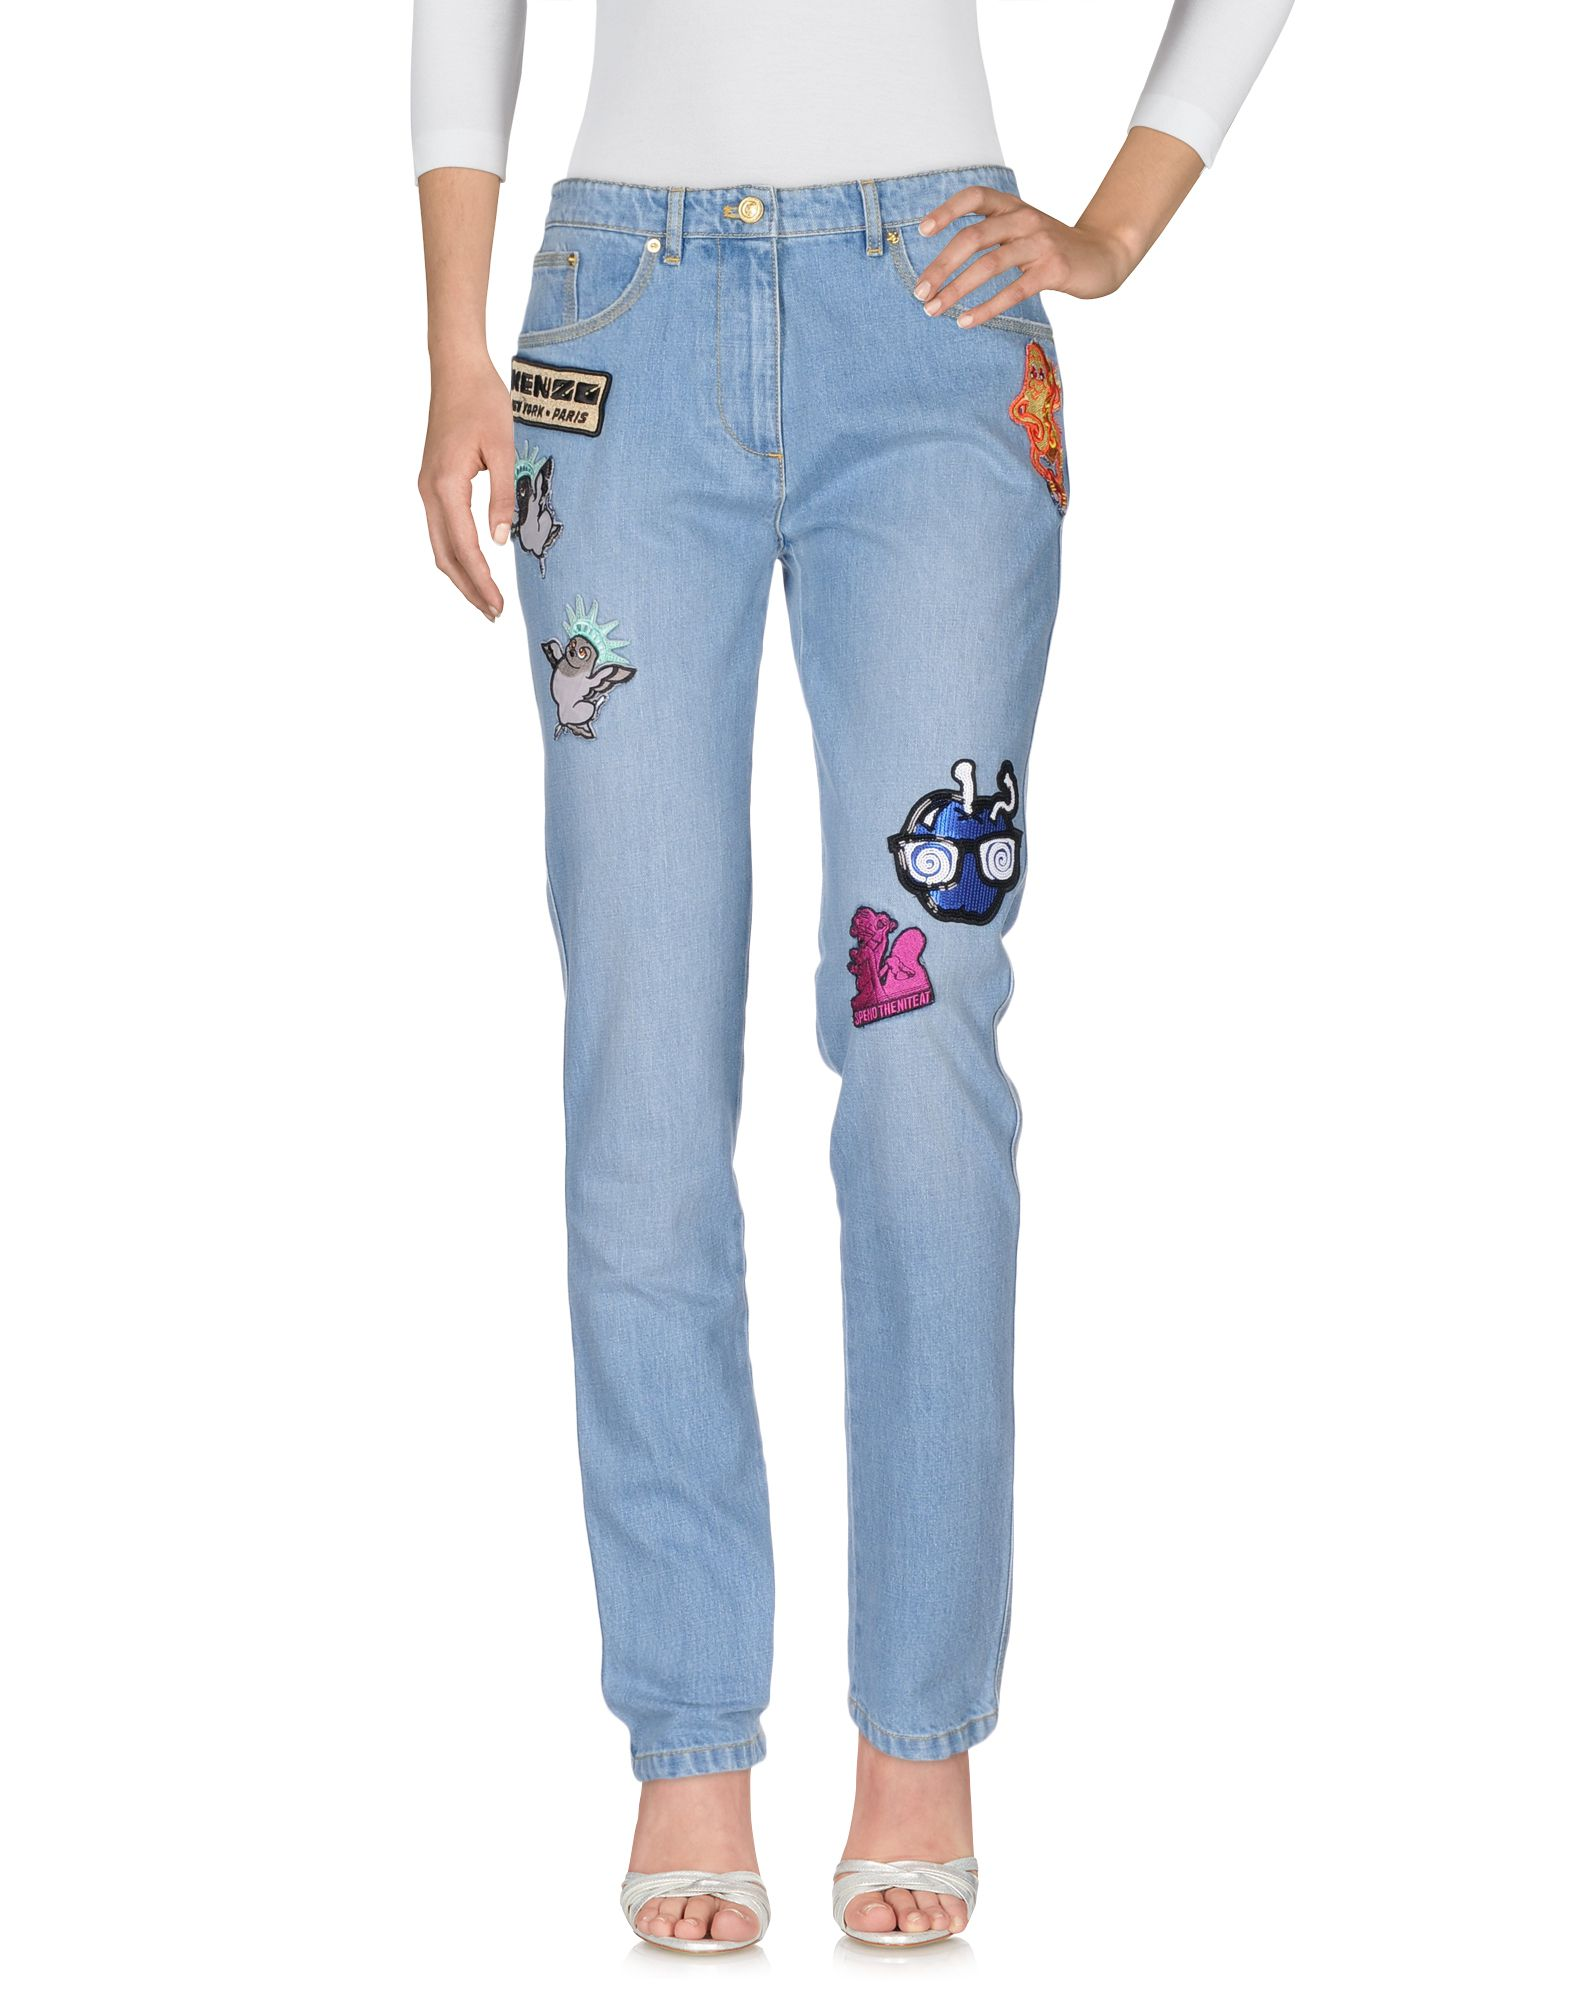 Pantaloni Jeans Kenzo Donna - Acquista online su JCUHSxFt